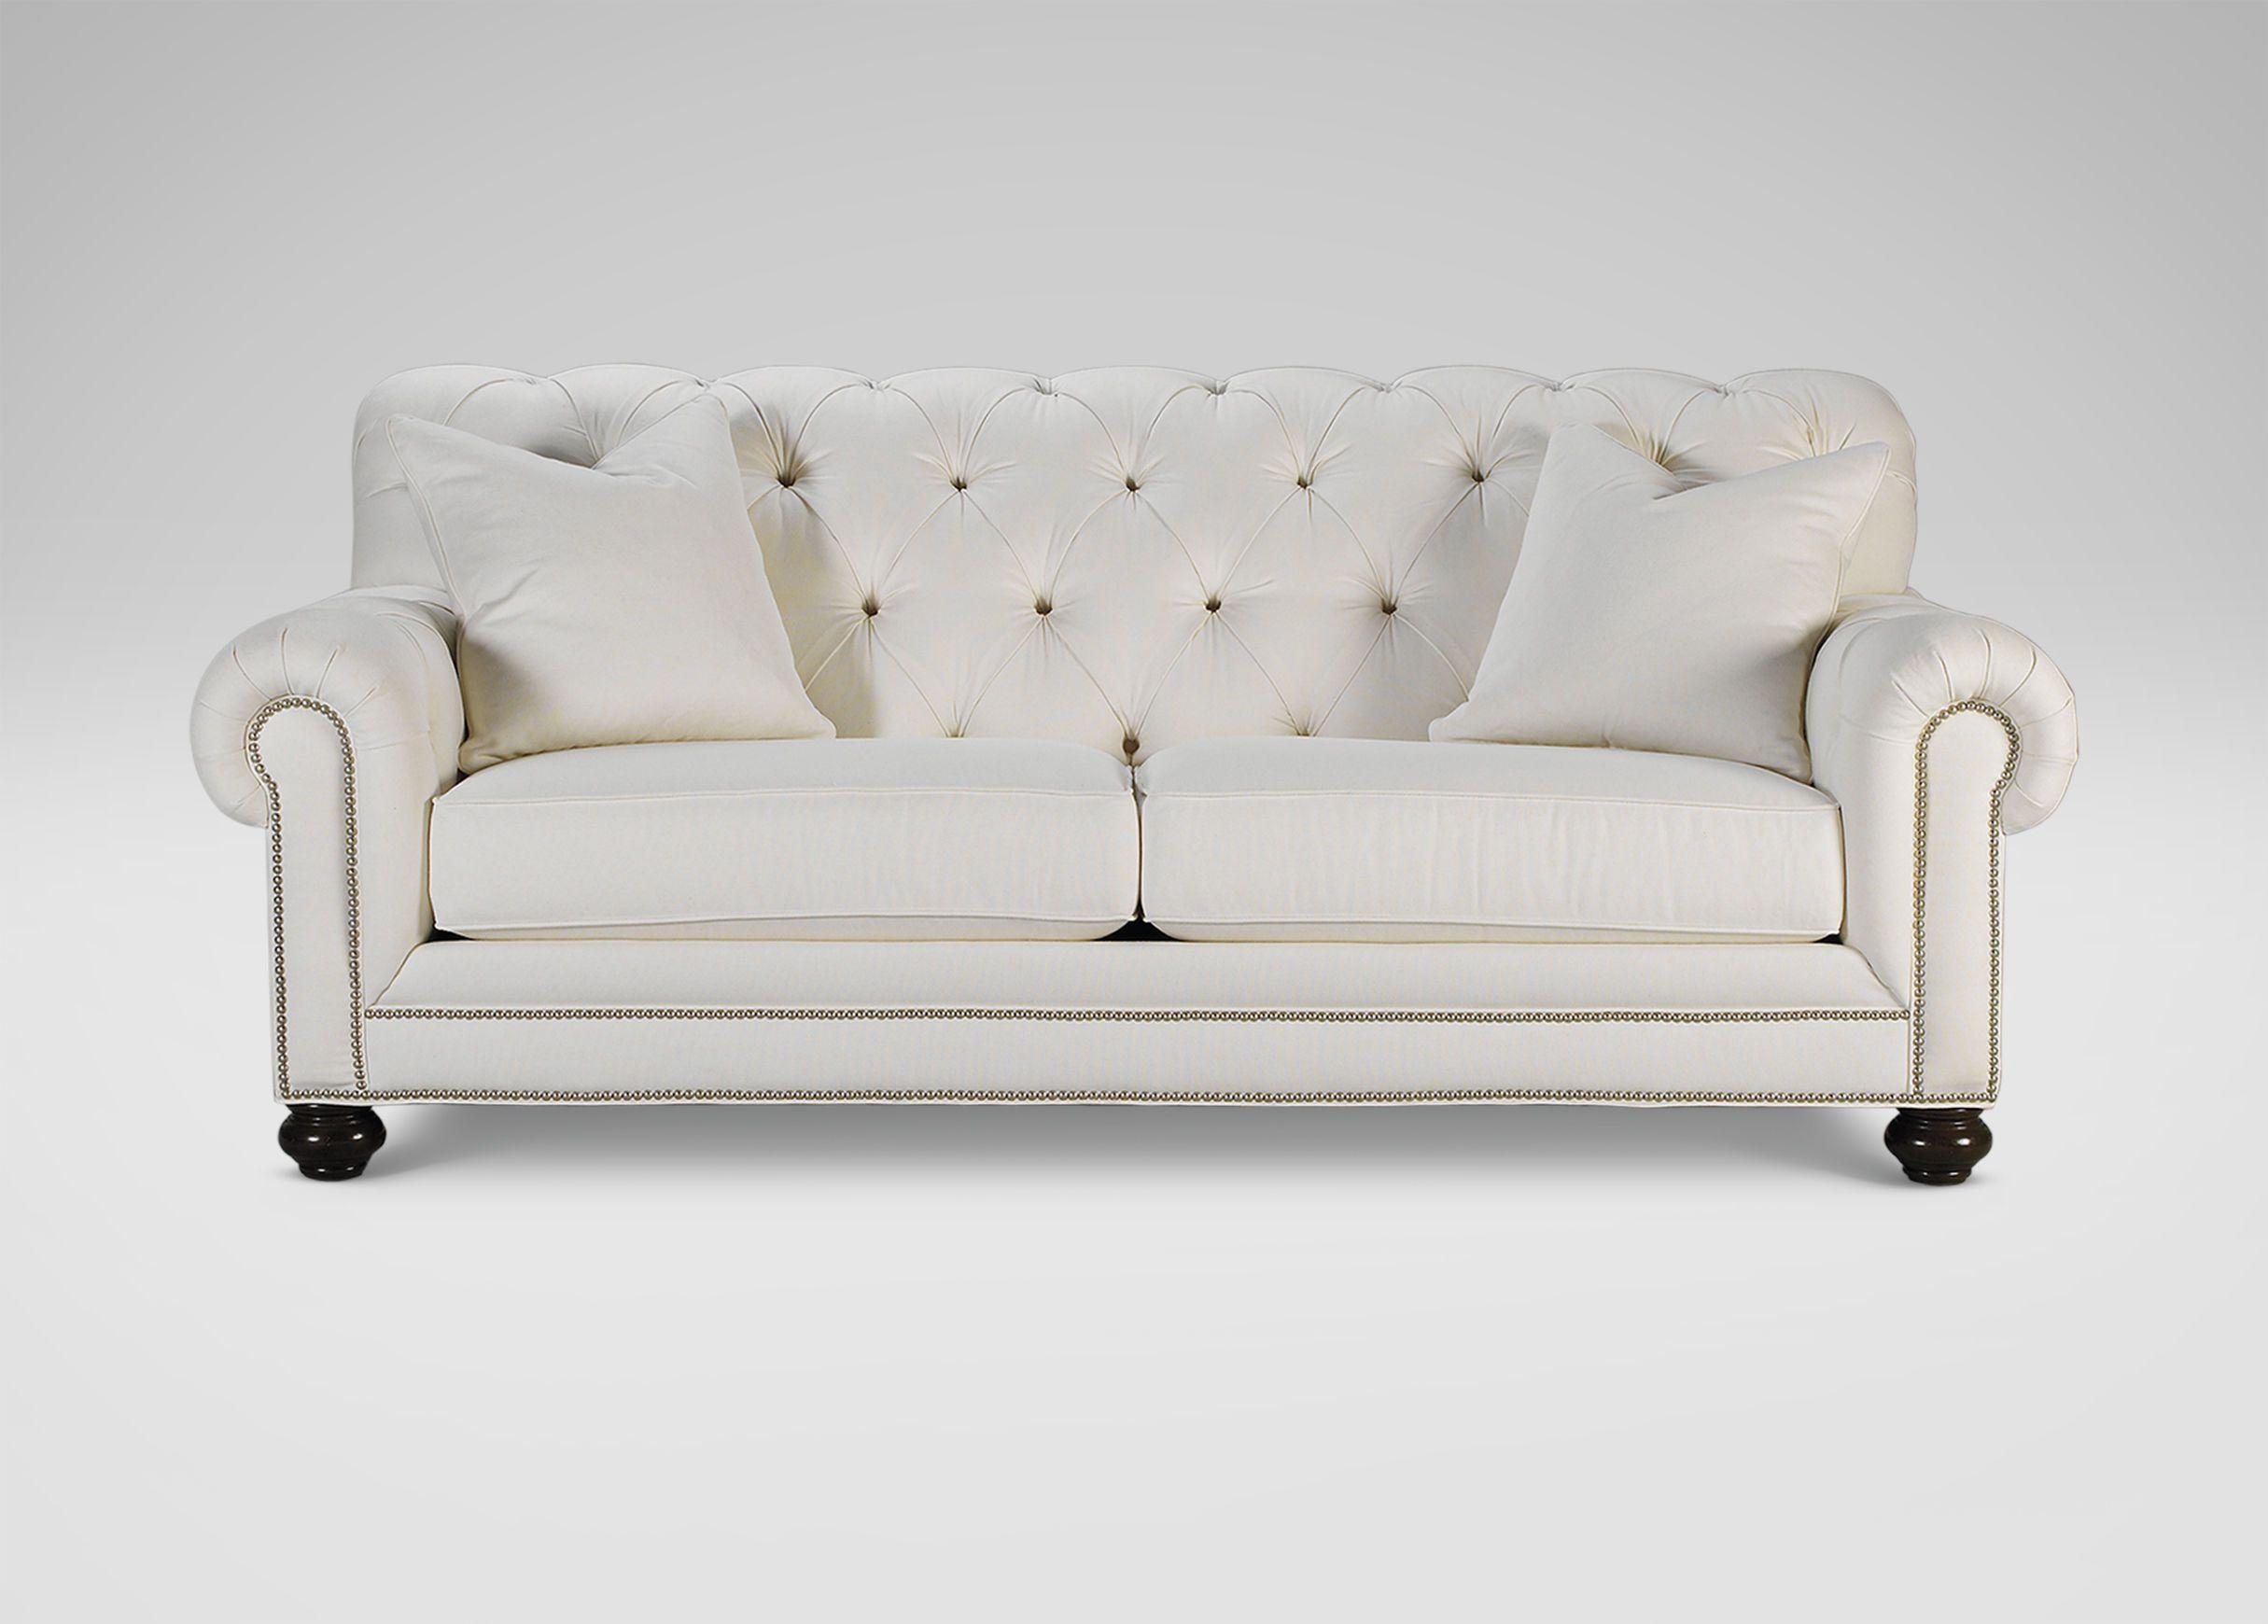 chadwick sofa brand comparisons ethan allen tufted pinterest loveseats